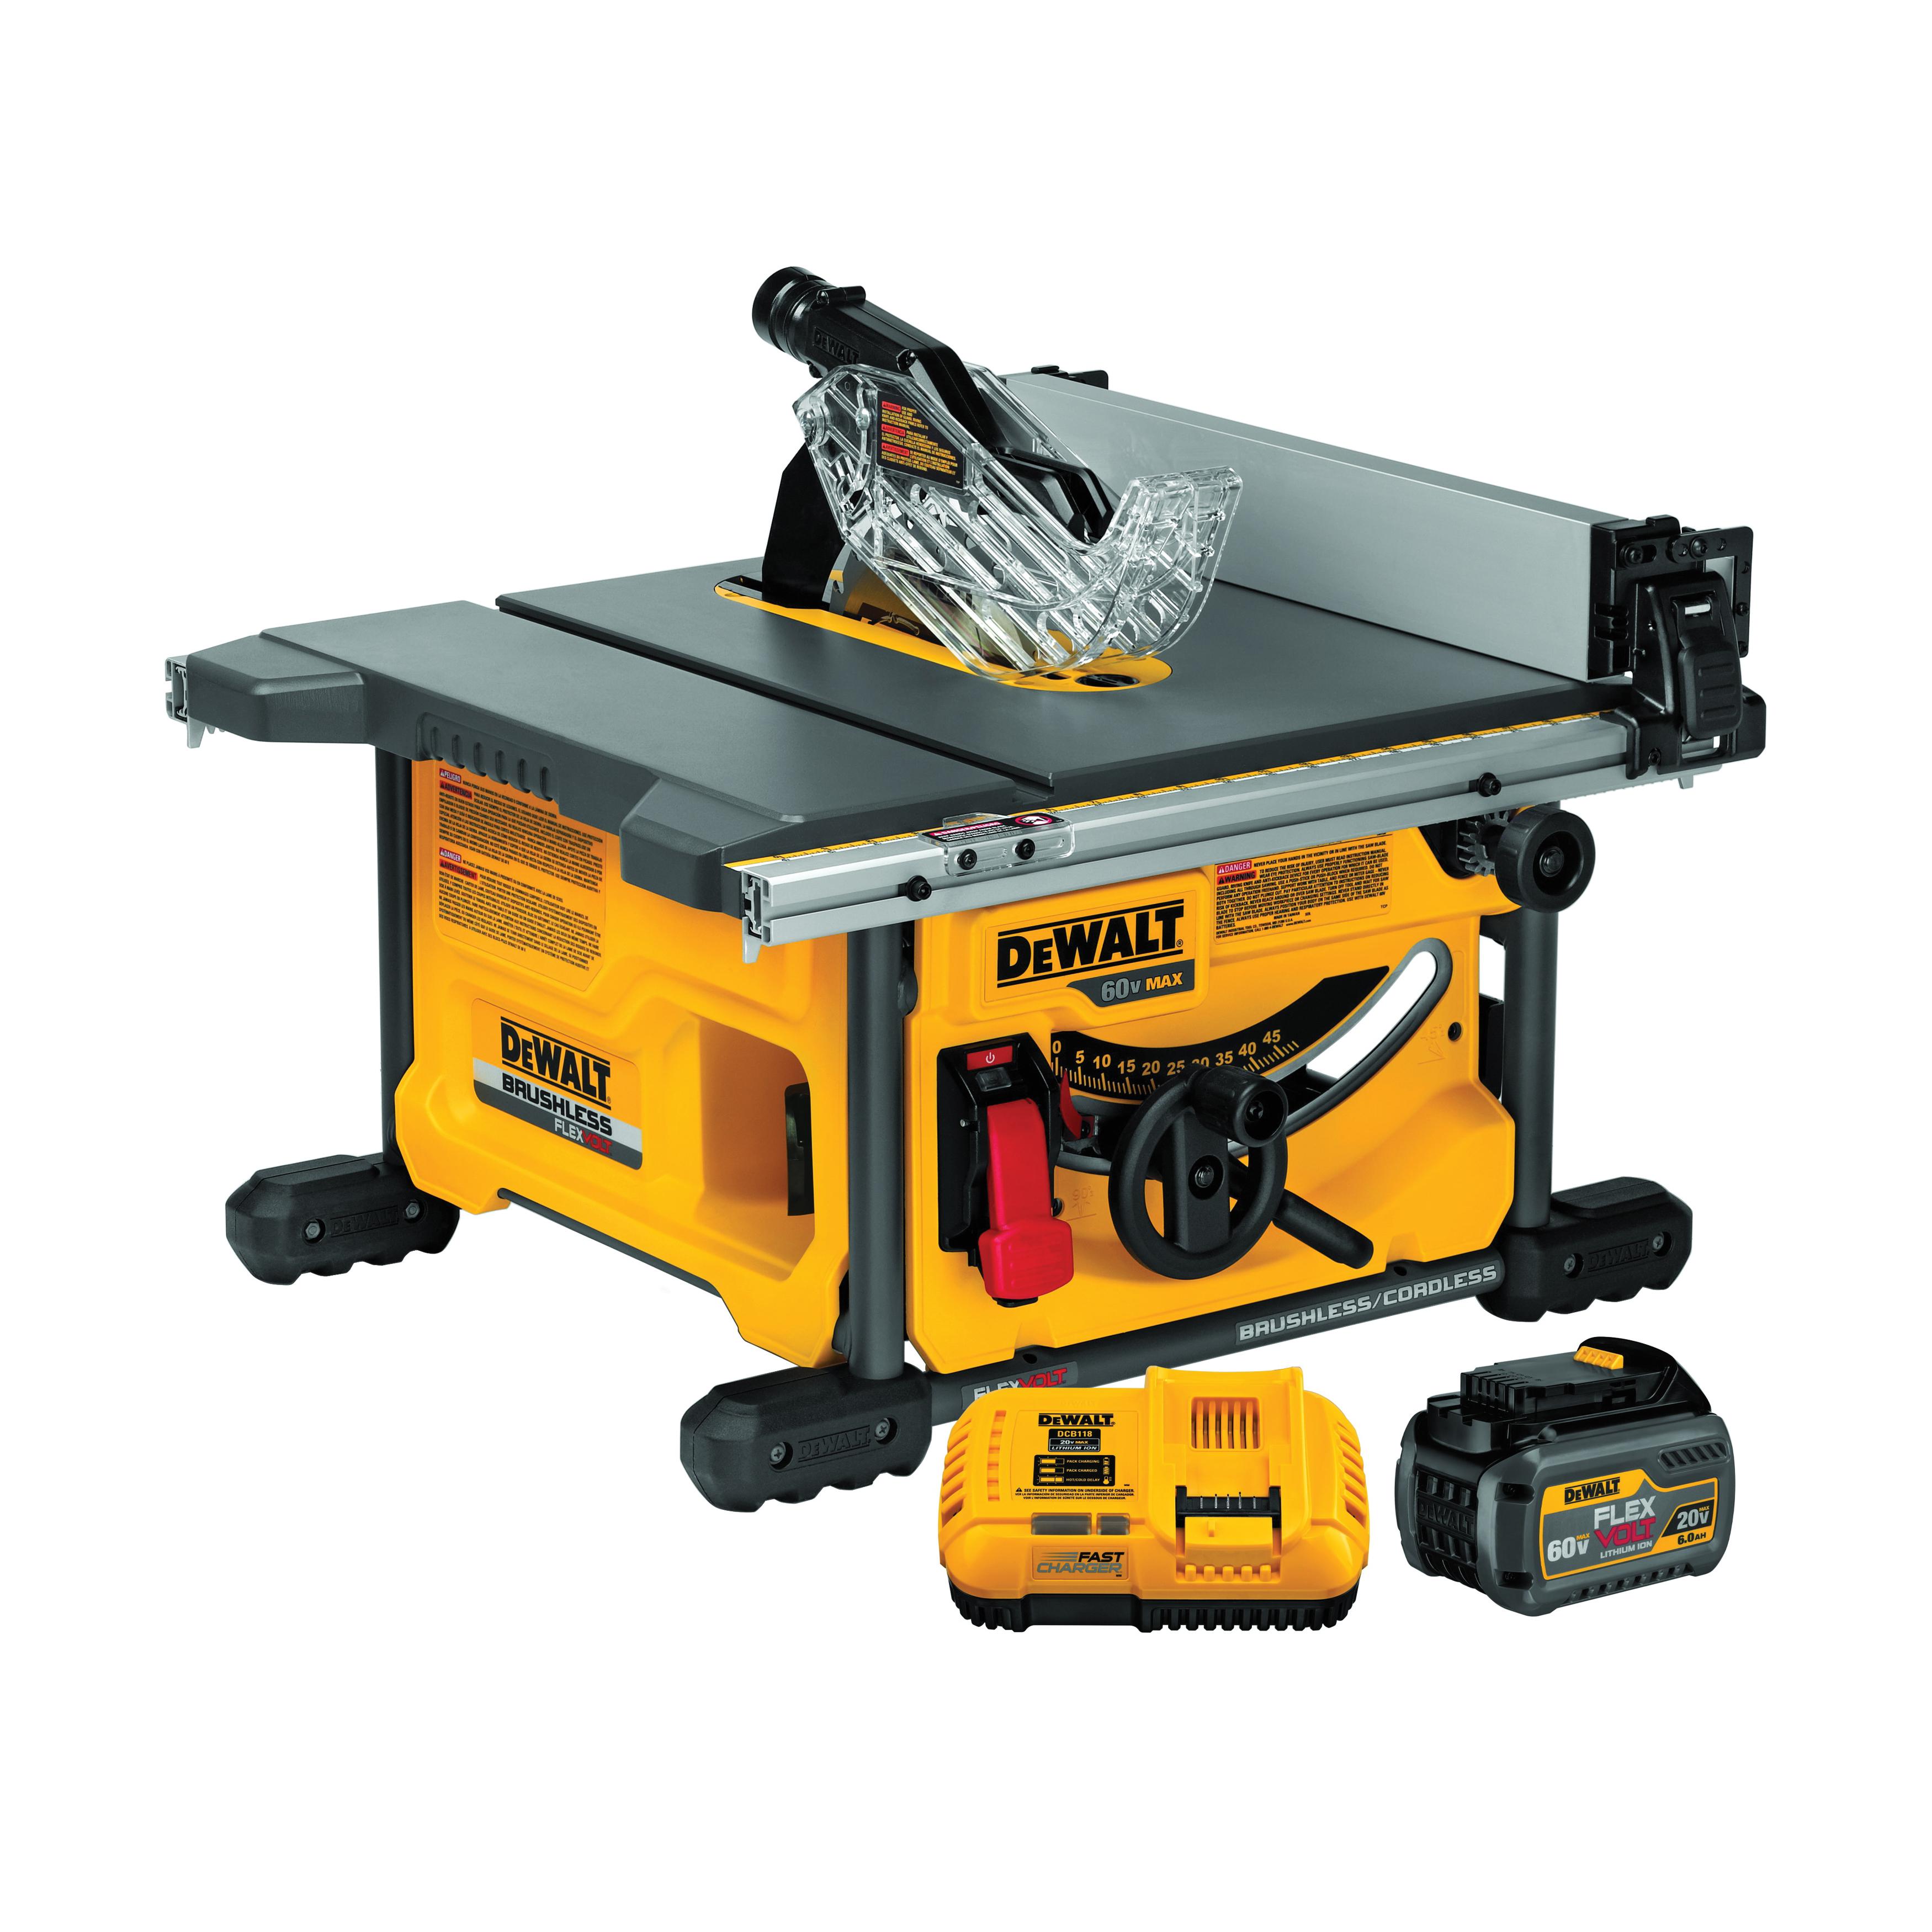 DeWALT® 60V MAX* FLEXVOLT™ DCS7485T1 Cordless Table Saw Kit, 8-1/4 in Dia Blade, 5/8 in Arbor/Shank, 1-3/4 in 45 deg Capacity, 2-1/2 in 90 deg Capacity